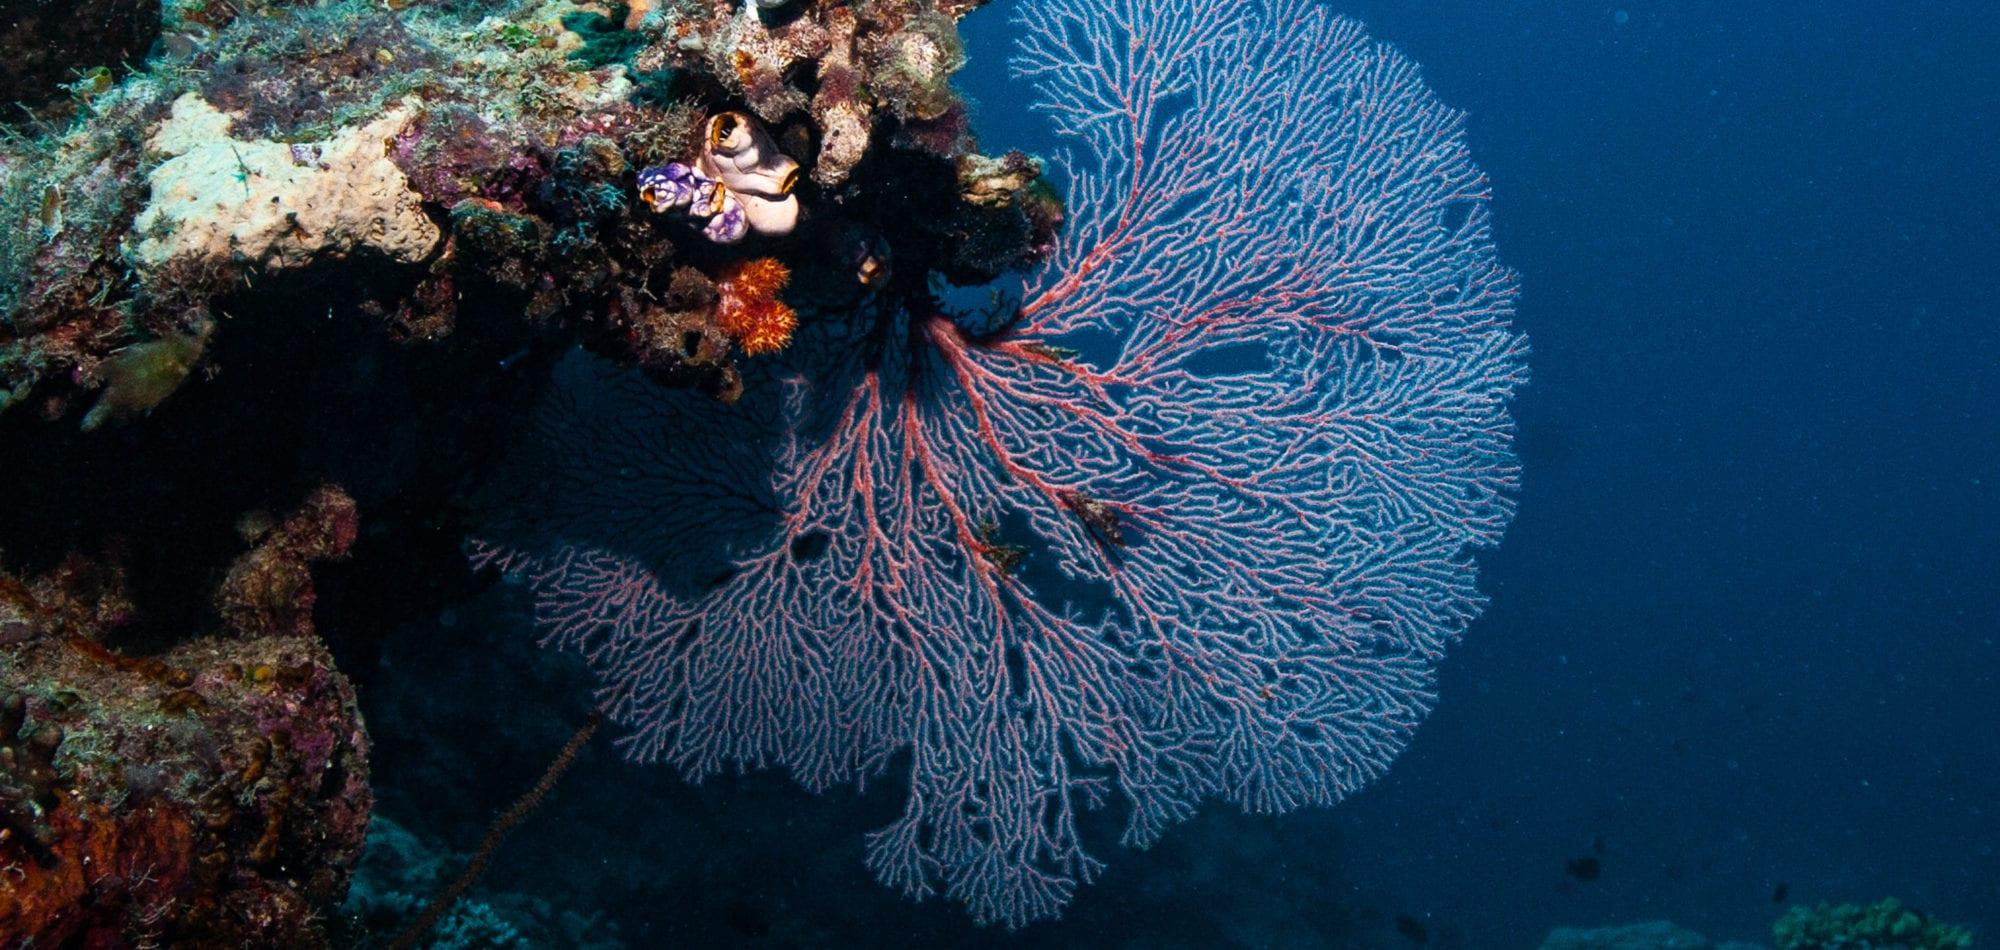 Cairns reef trip - Fan Coral, Great Barrier Reef